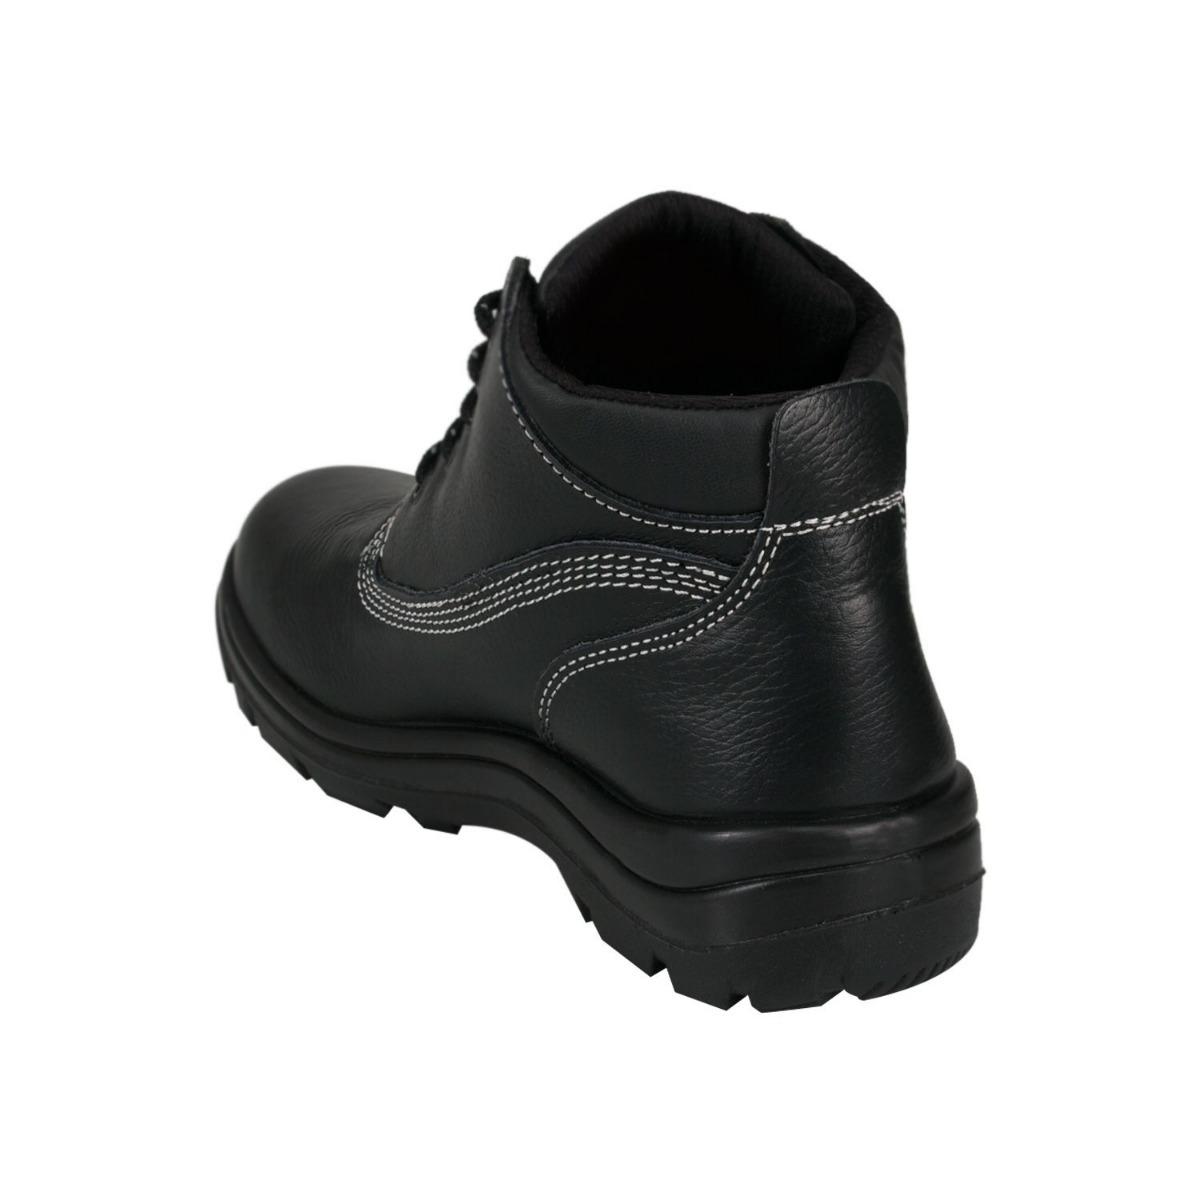 f9a35cca280 bota industrial caballero van vien negro 158109 cab 19 j. Cargando zoom.